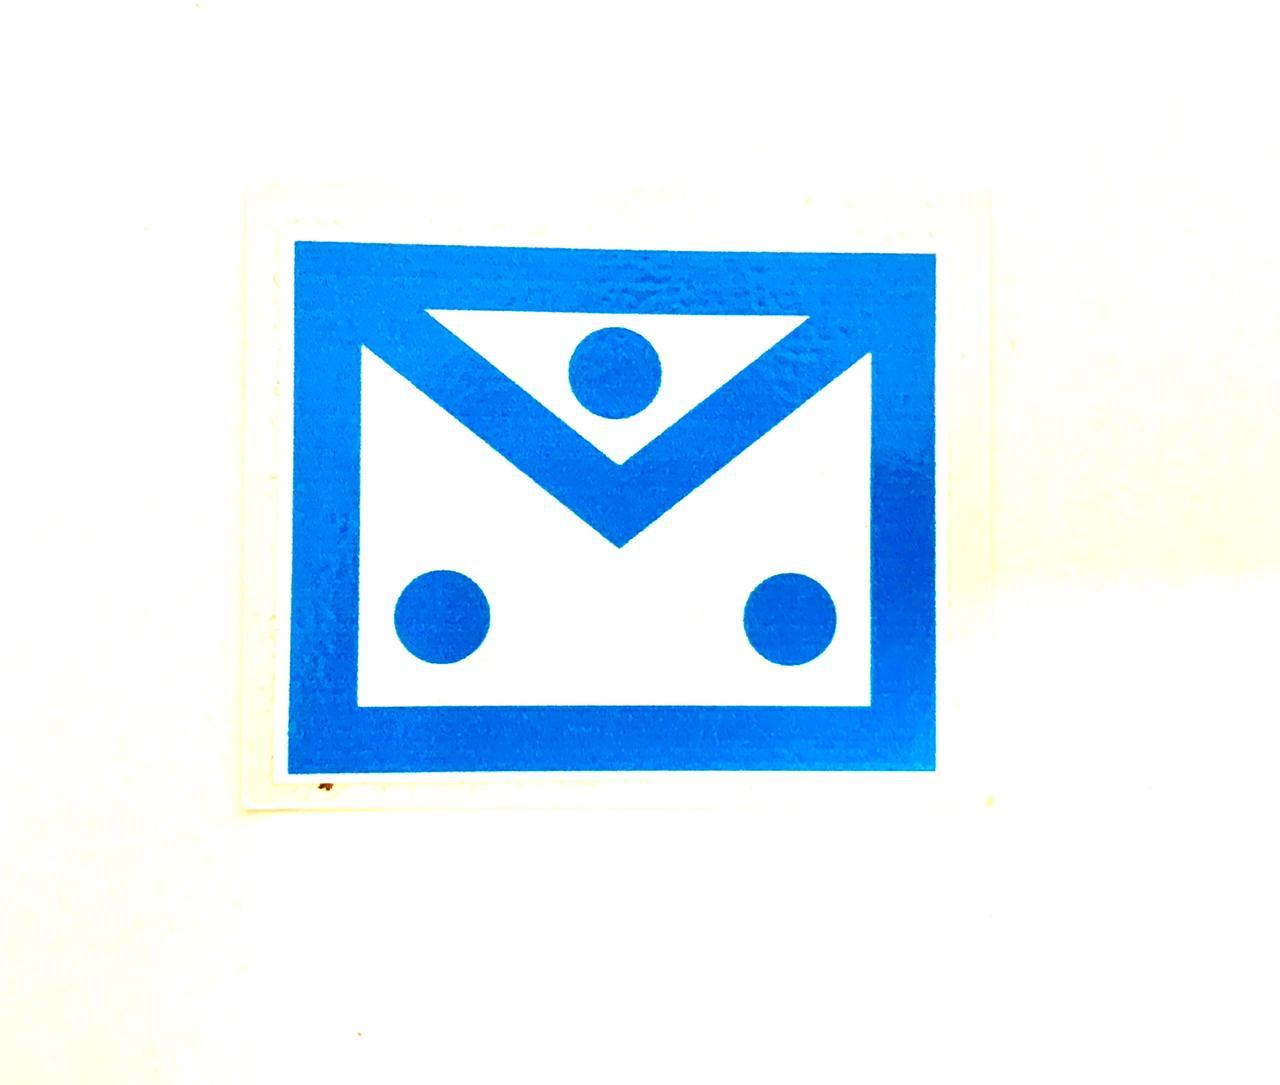 Adesivo Avental - Azul